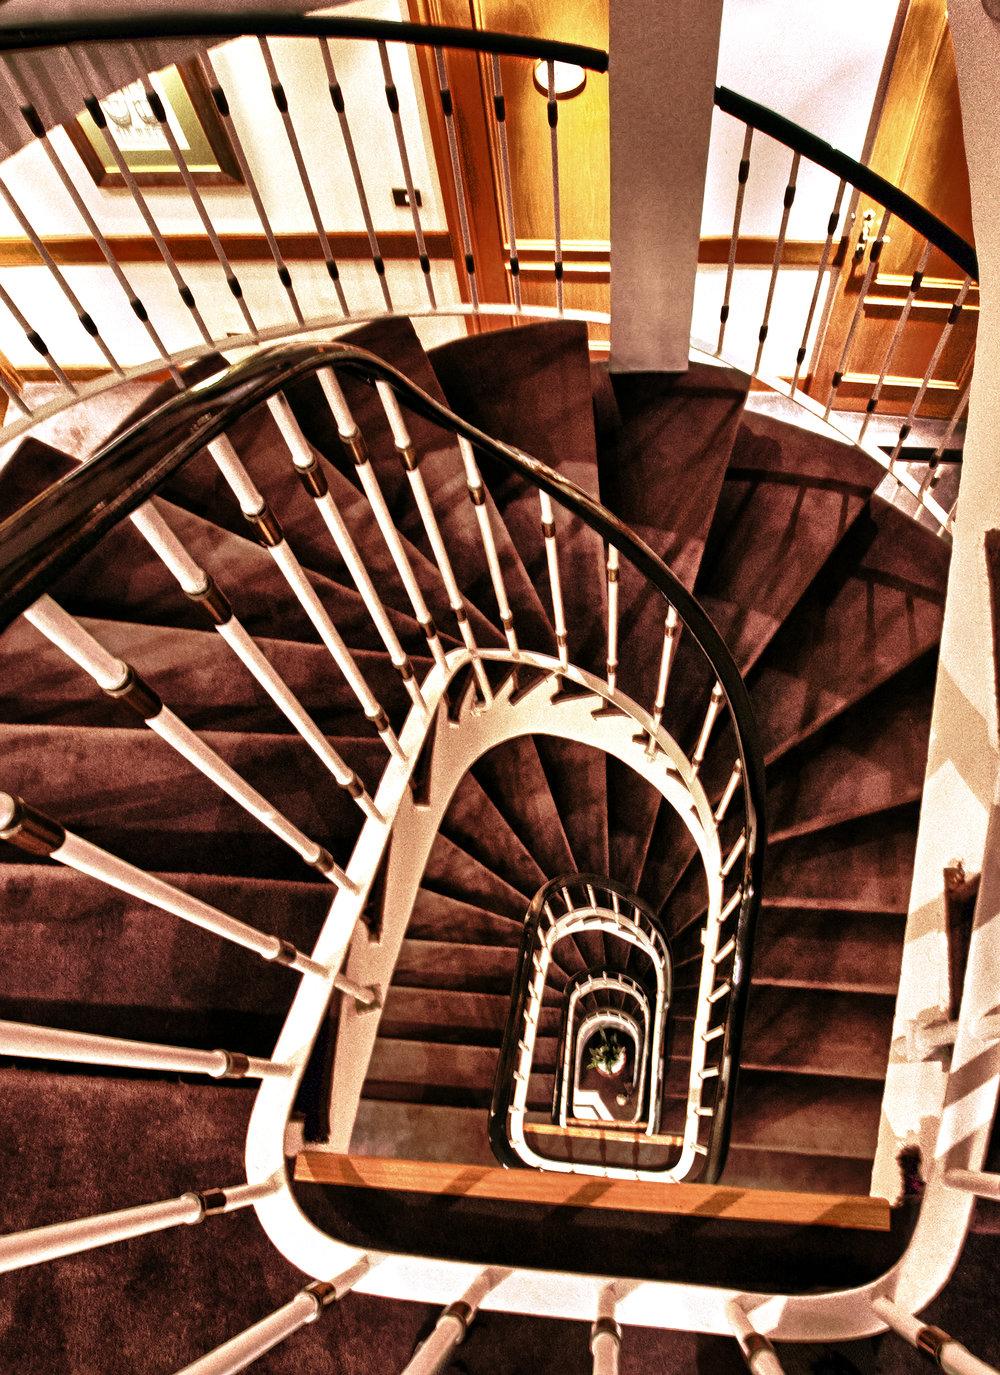 HotelStairs4HDREfexProFINAL.jpg